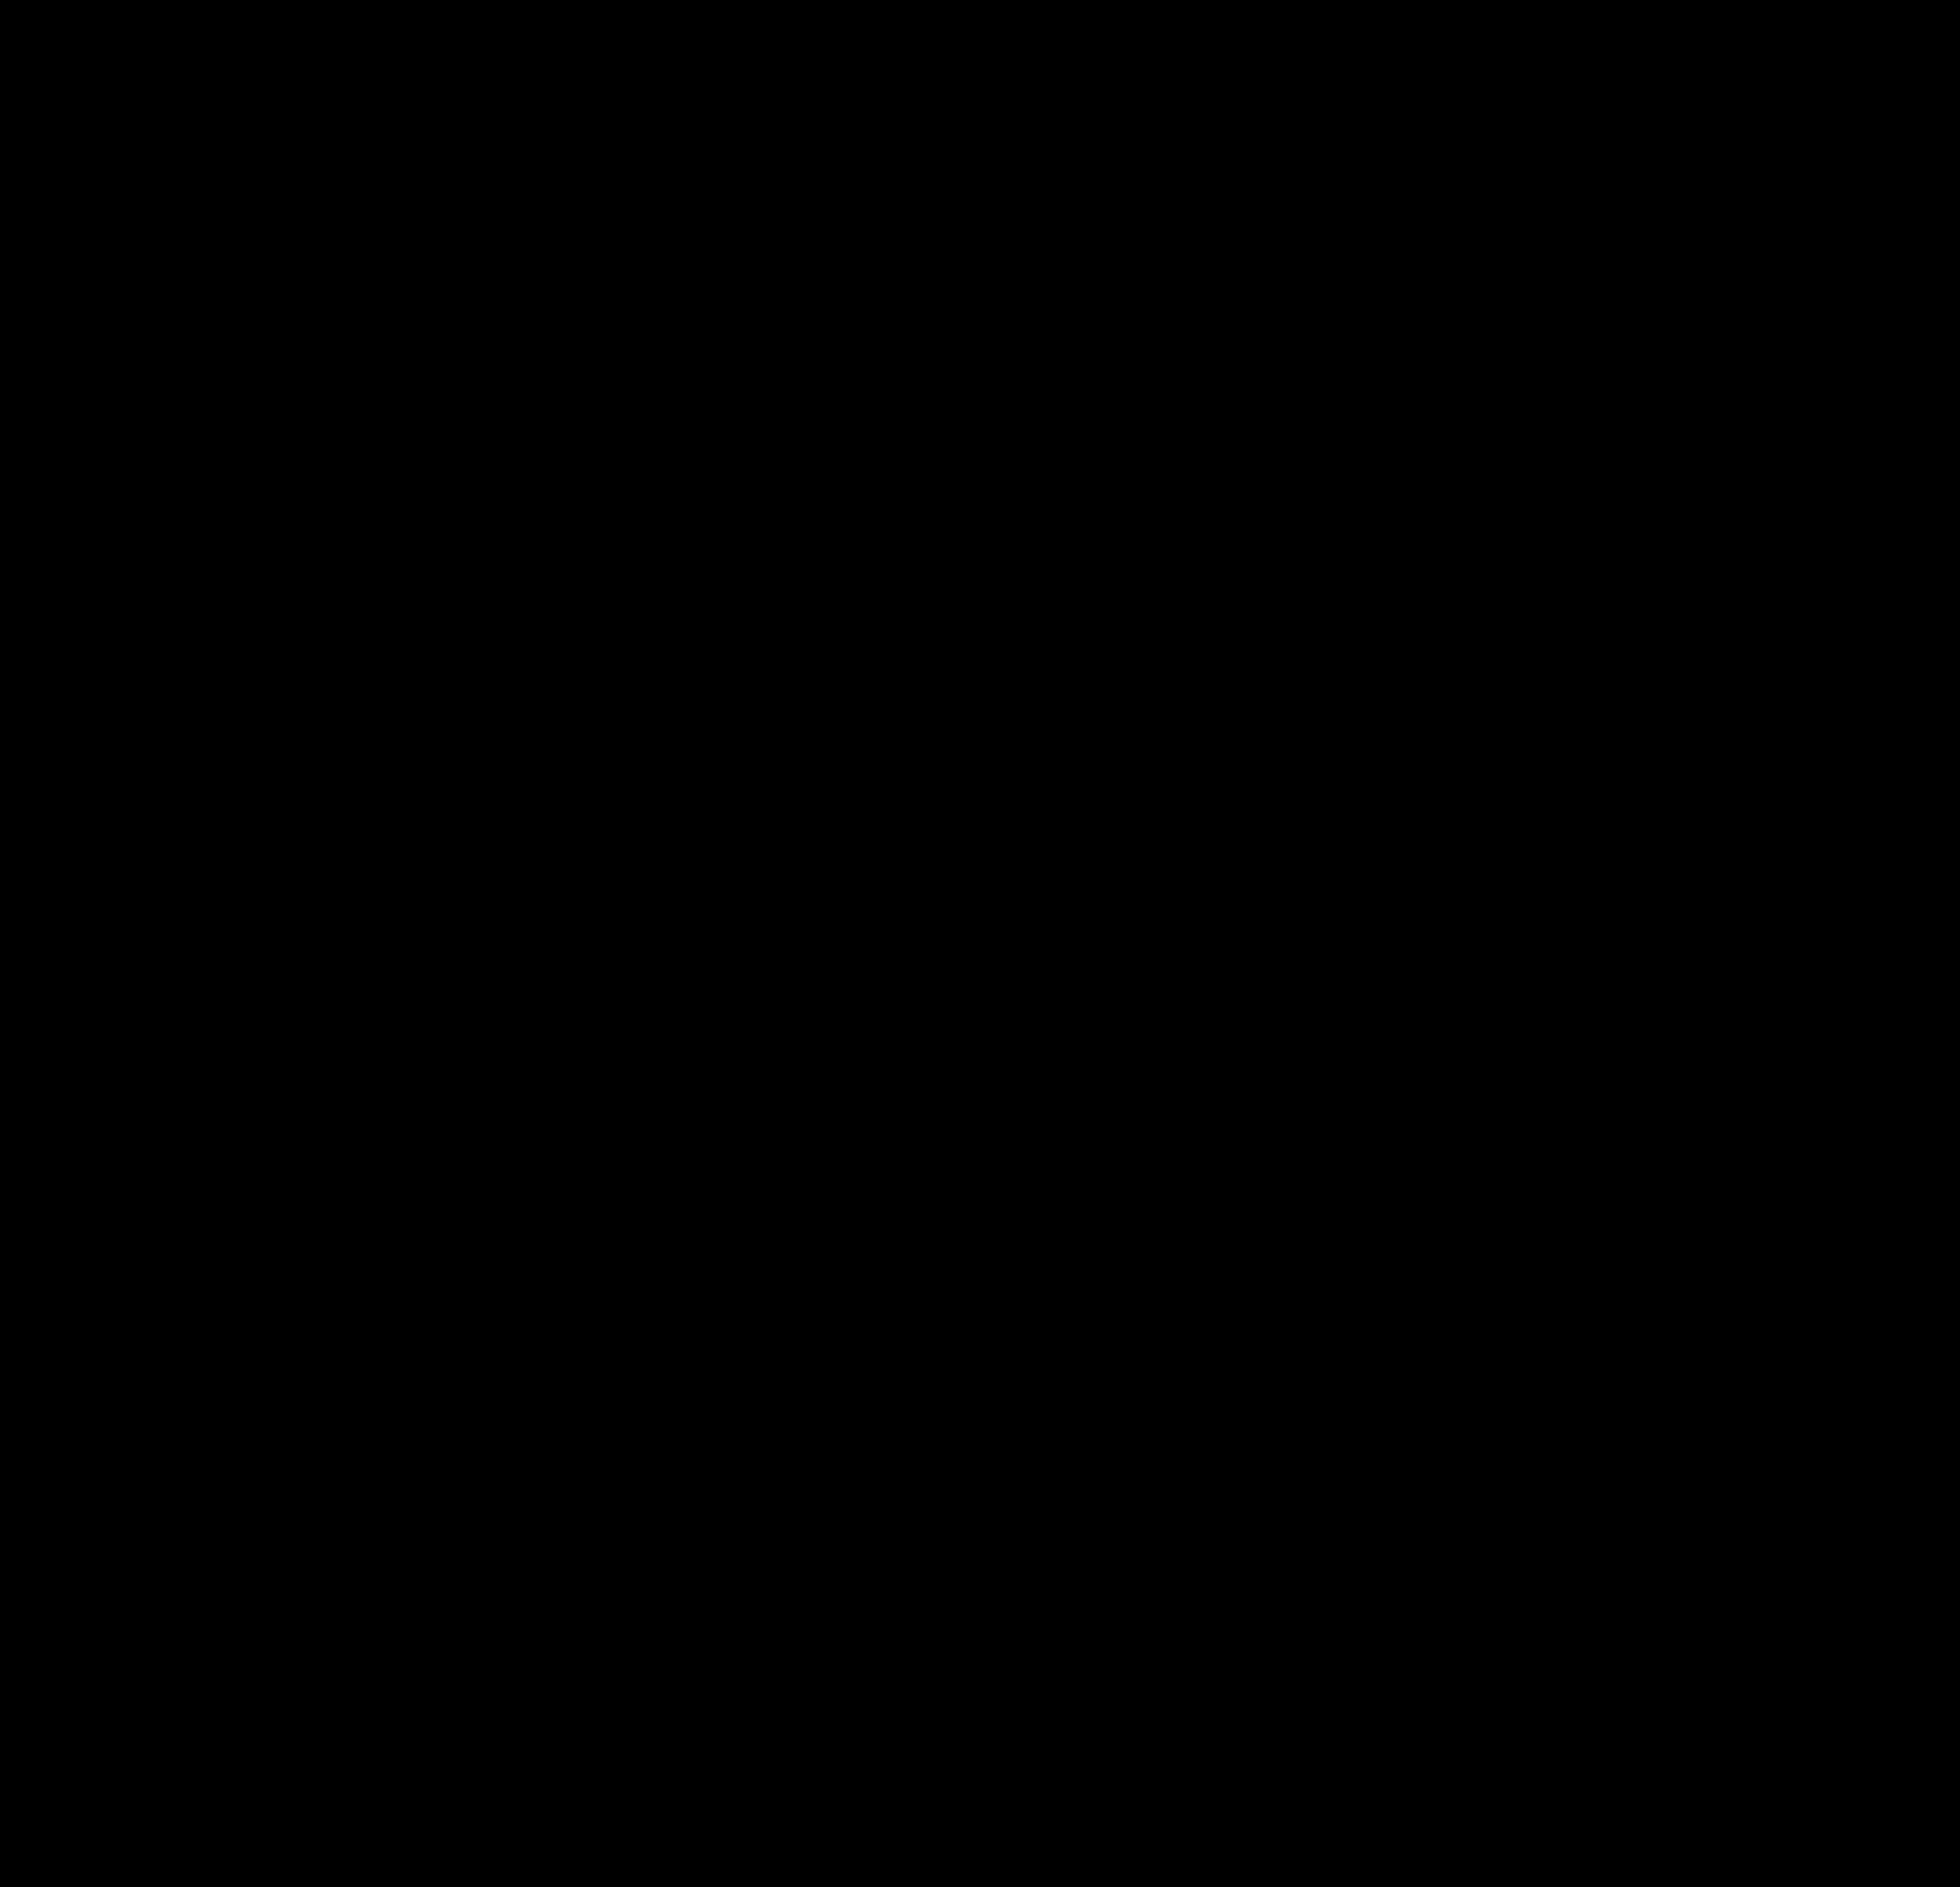 8 Grunge Brush Stroke Heart (PNG Transparent) | OnlyGFX com